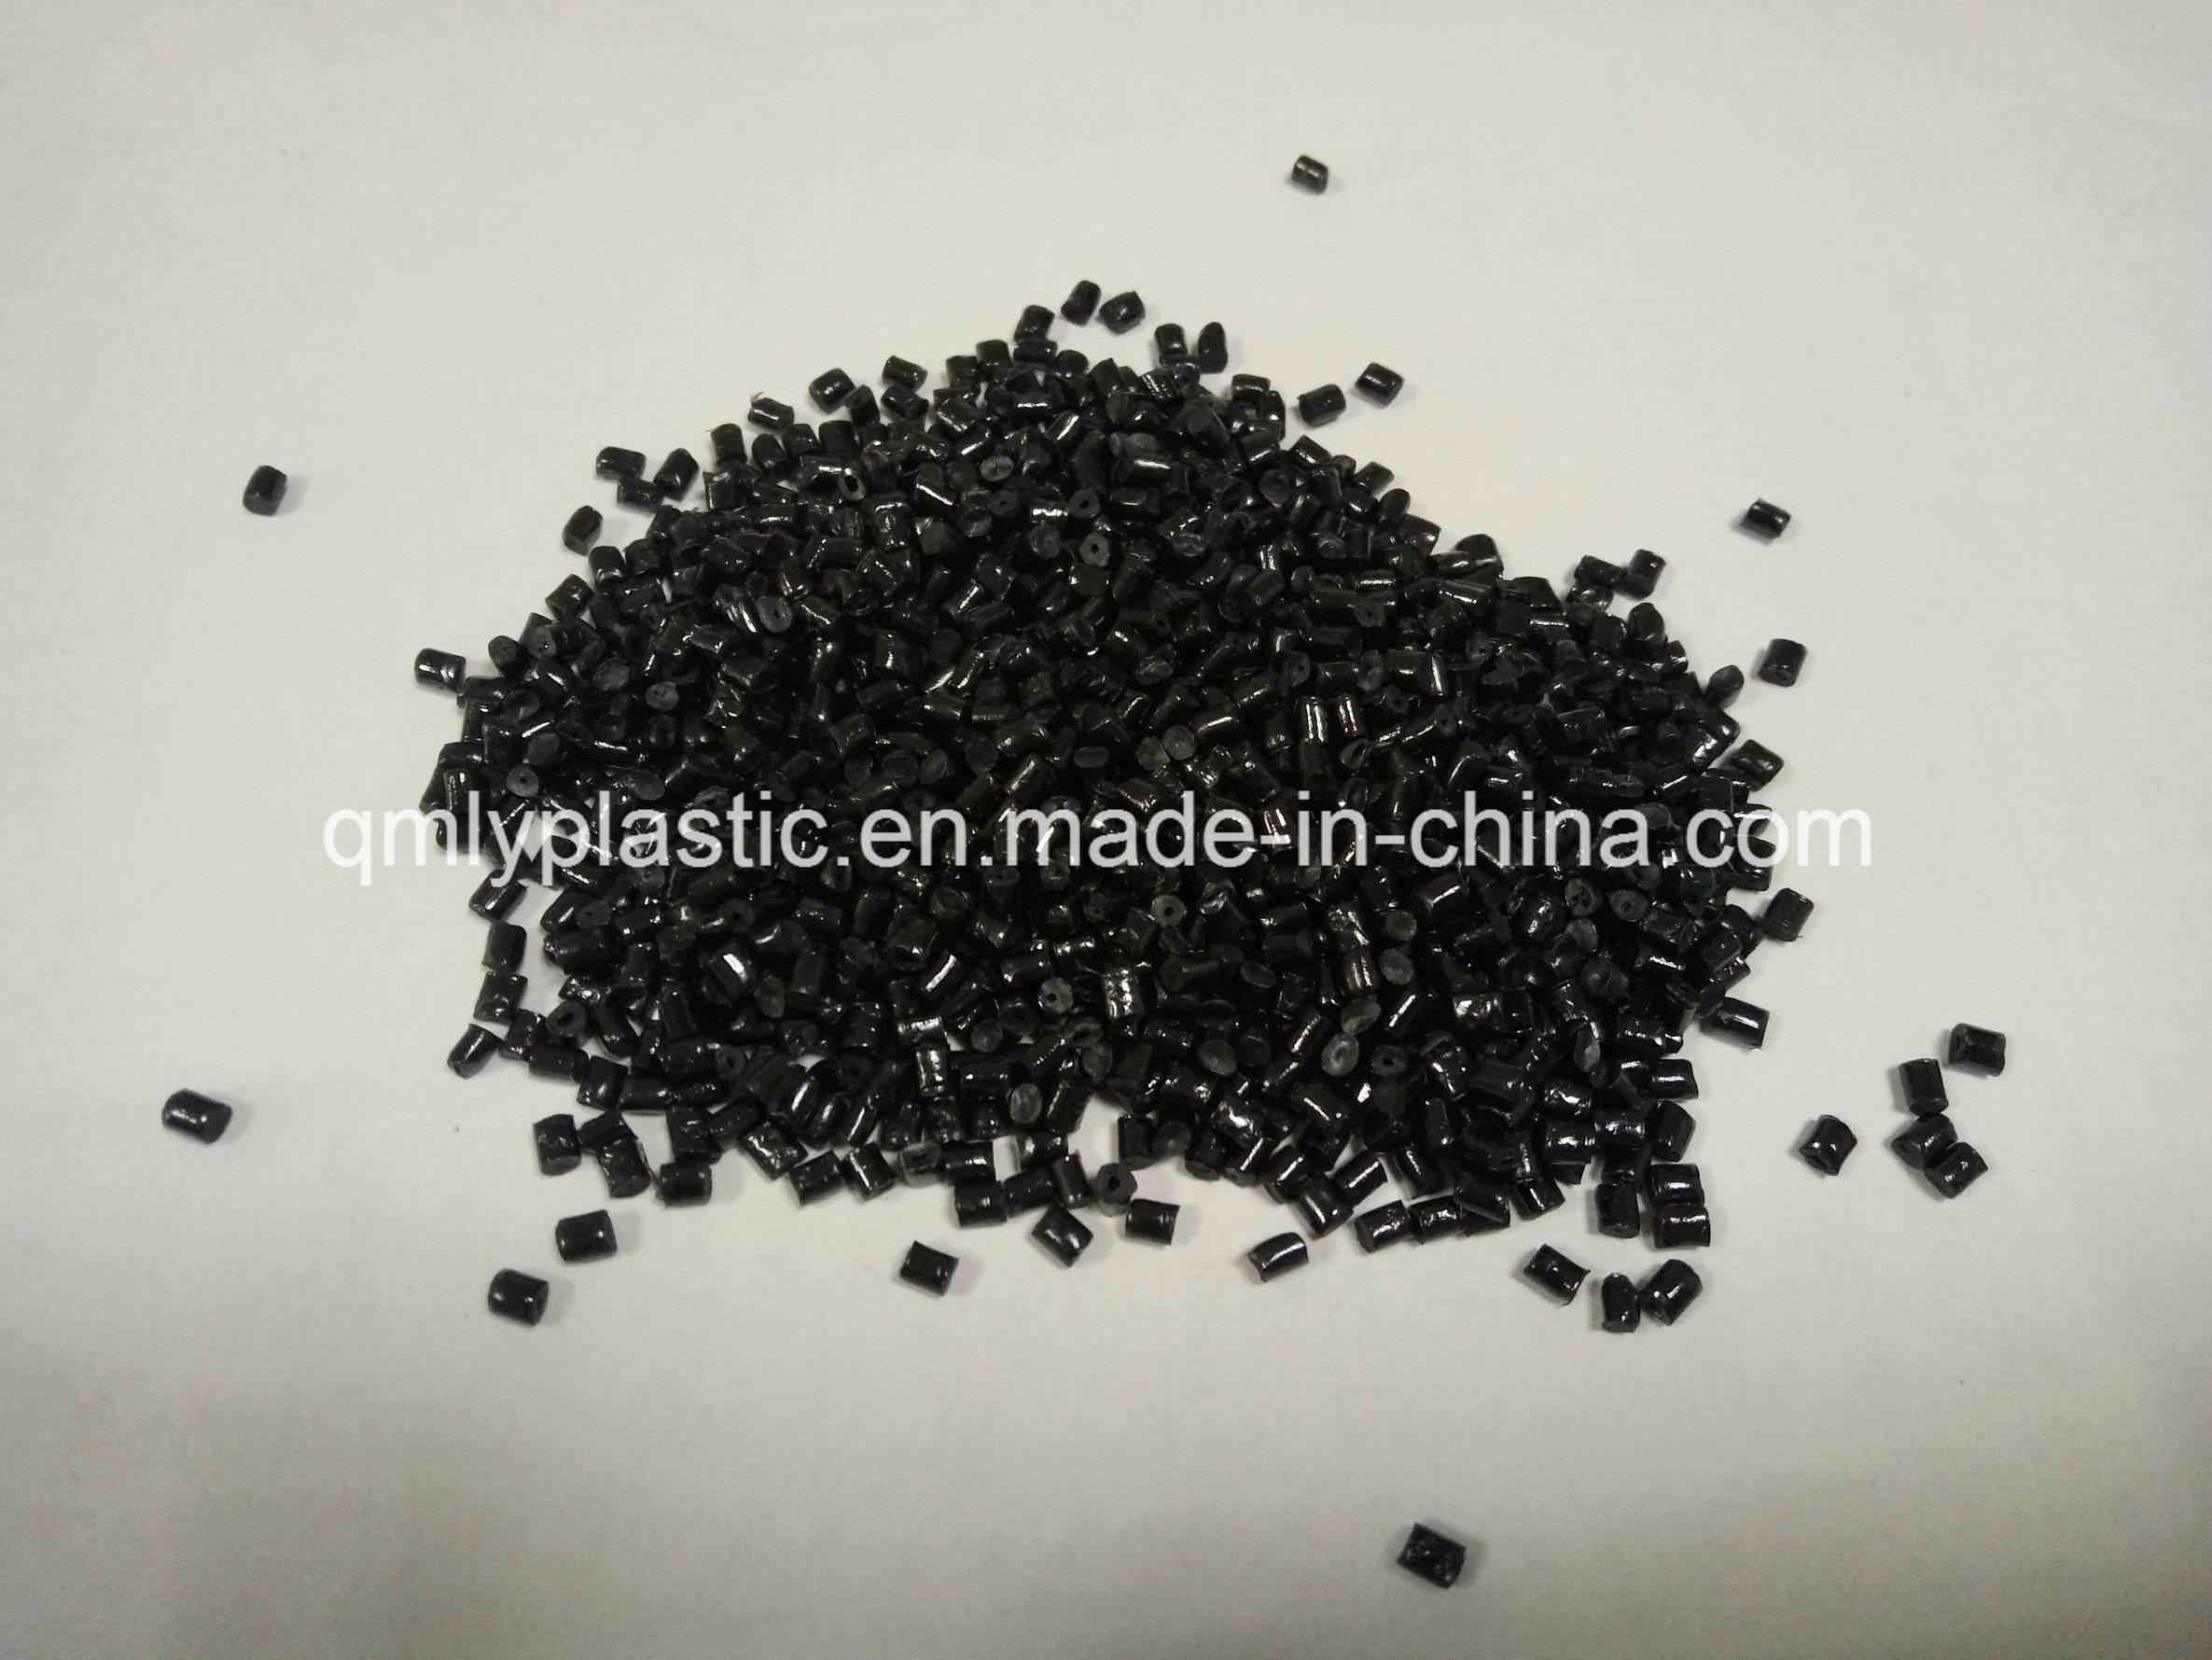 Amber Polyetherimide Resin/Pei Plastic for Optical Eyeglasses